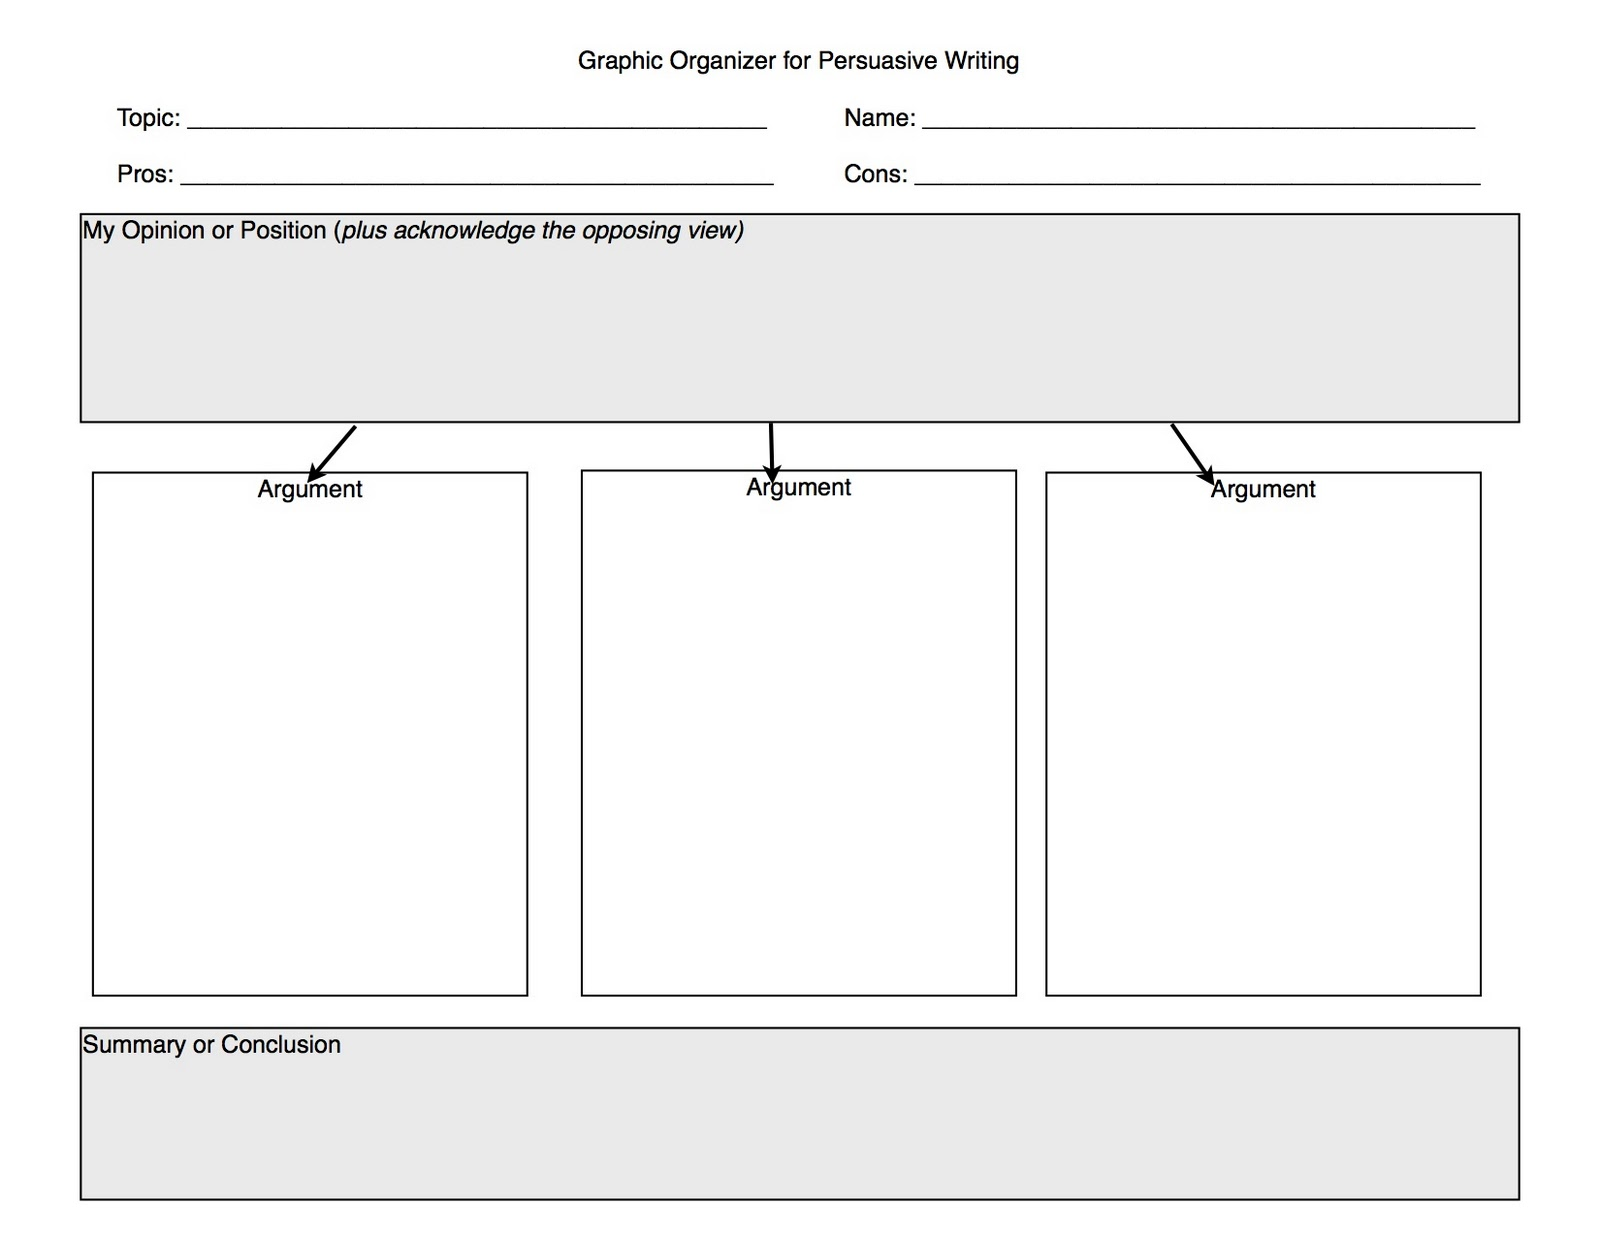 019 Essay Example Persuasive Writing Graphic Organizer Argumentative Impressive Pdf Middle School Full